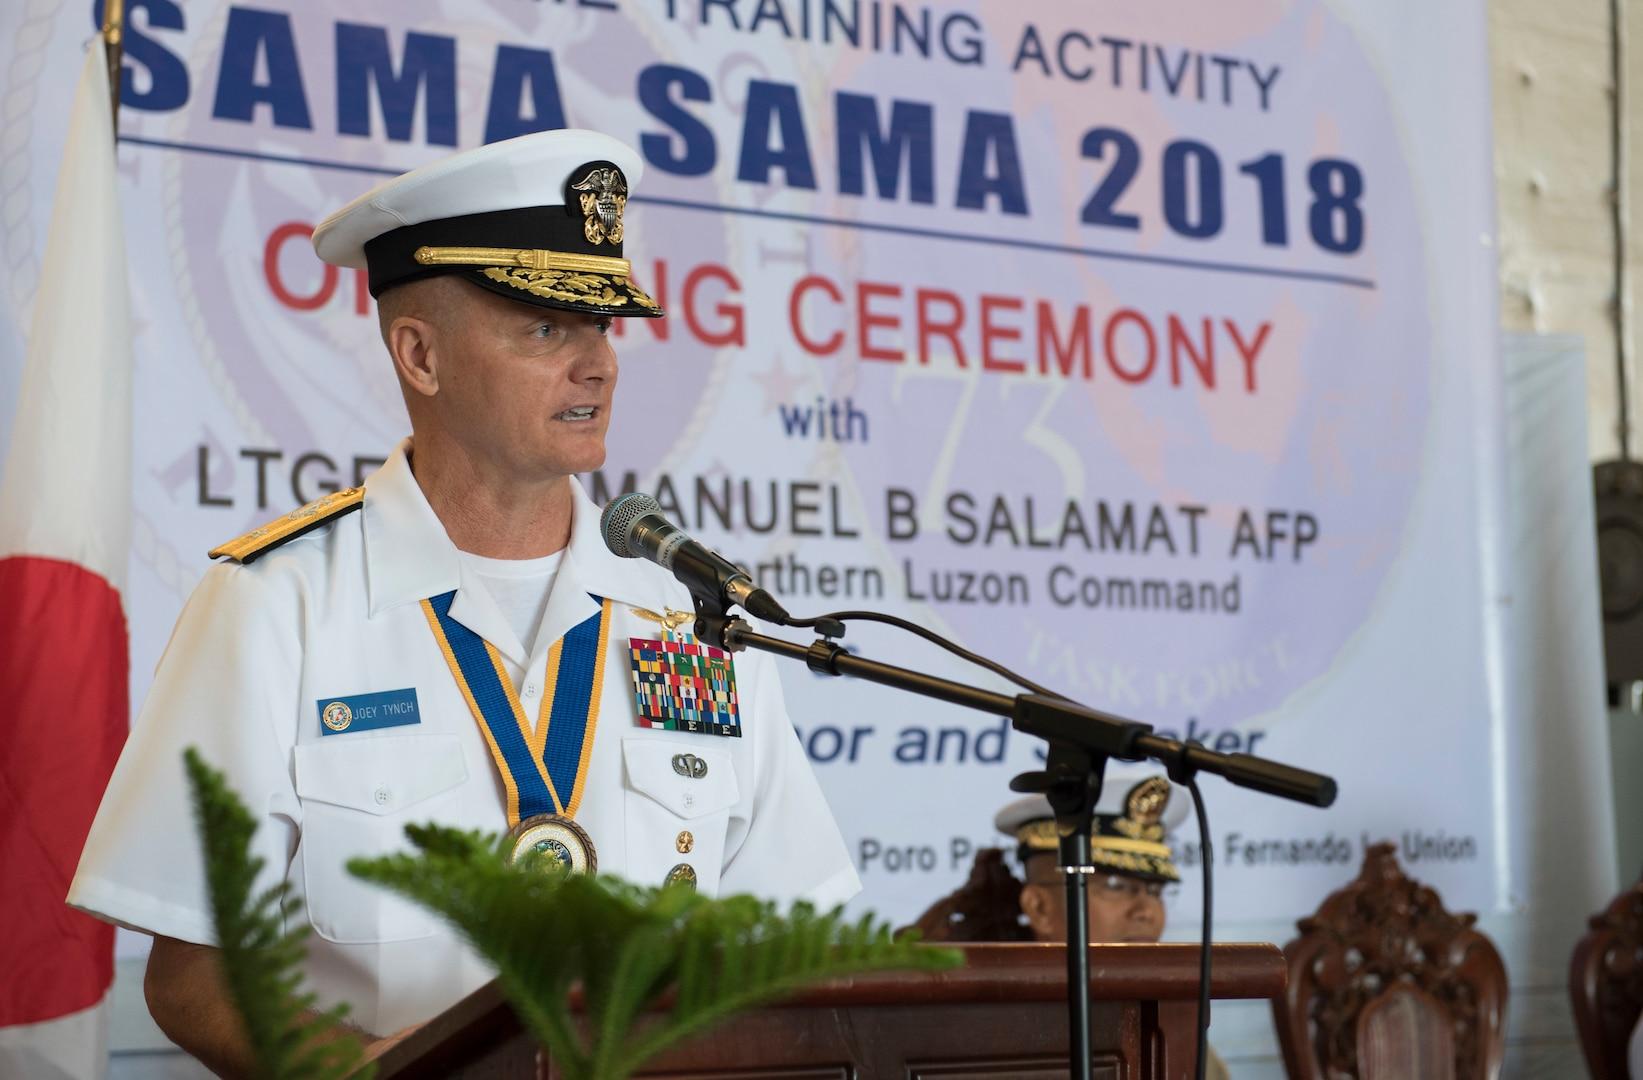 U.S., Philippines Strengthen Alliance with Maritime Training Activity Sama Sama